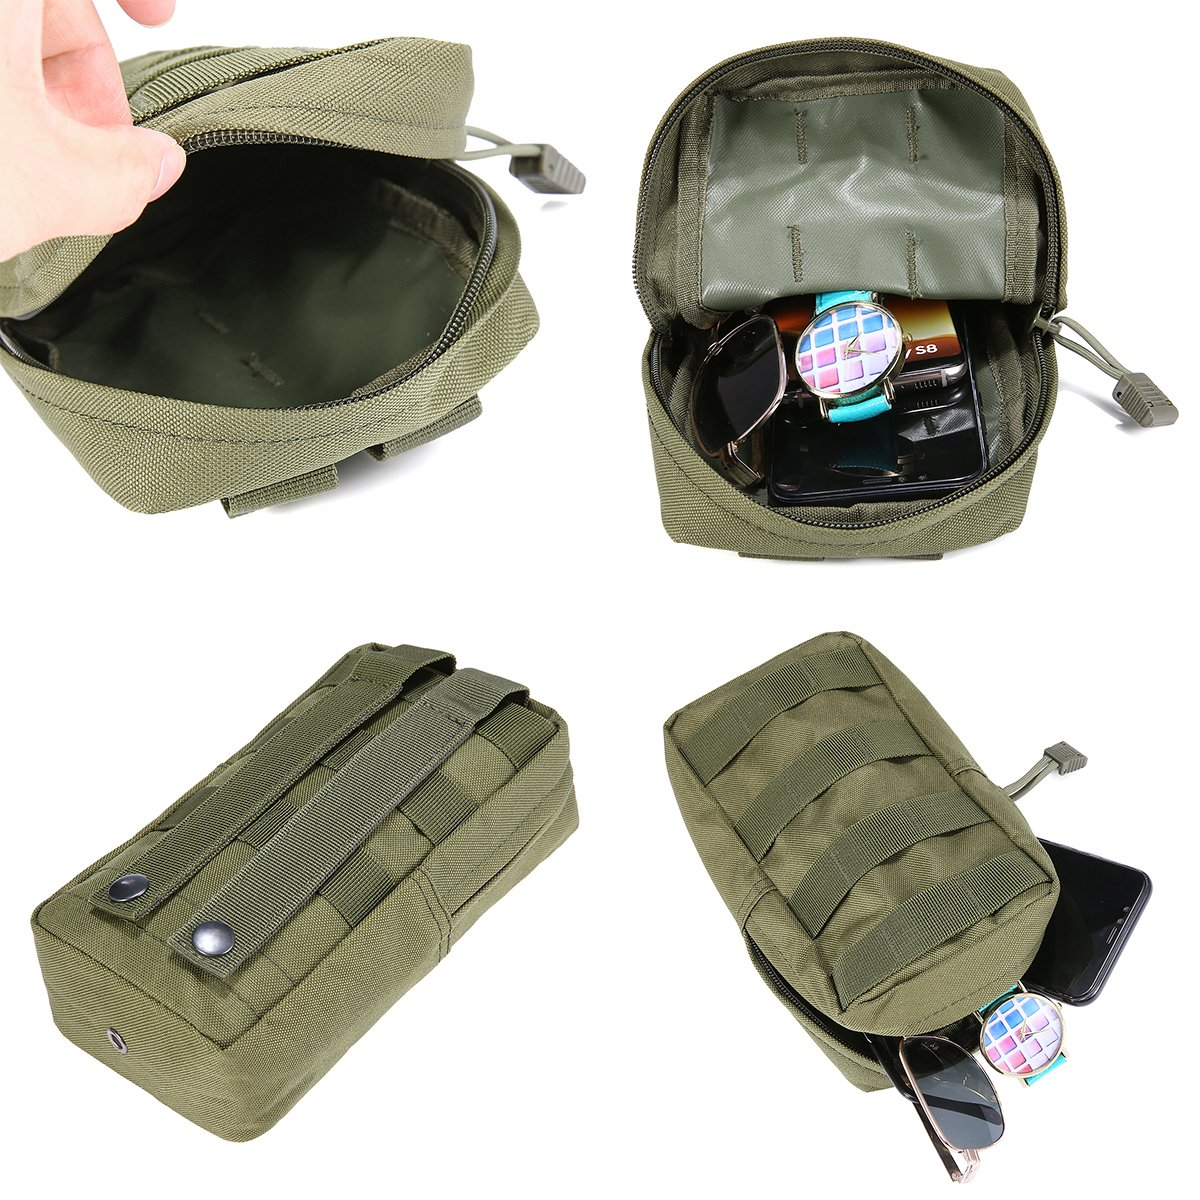 Black FUNTOK Senderismo Paquetes de Cintura Pouch Pockets Outdoor Sports Utility Gadget Gear Hanging Waist Bags /…